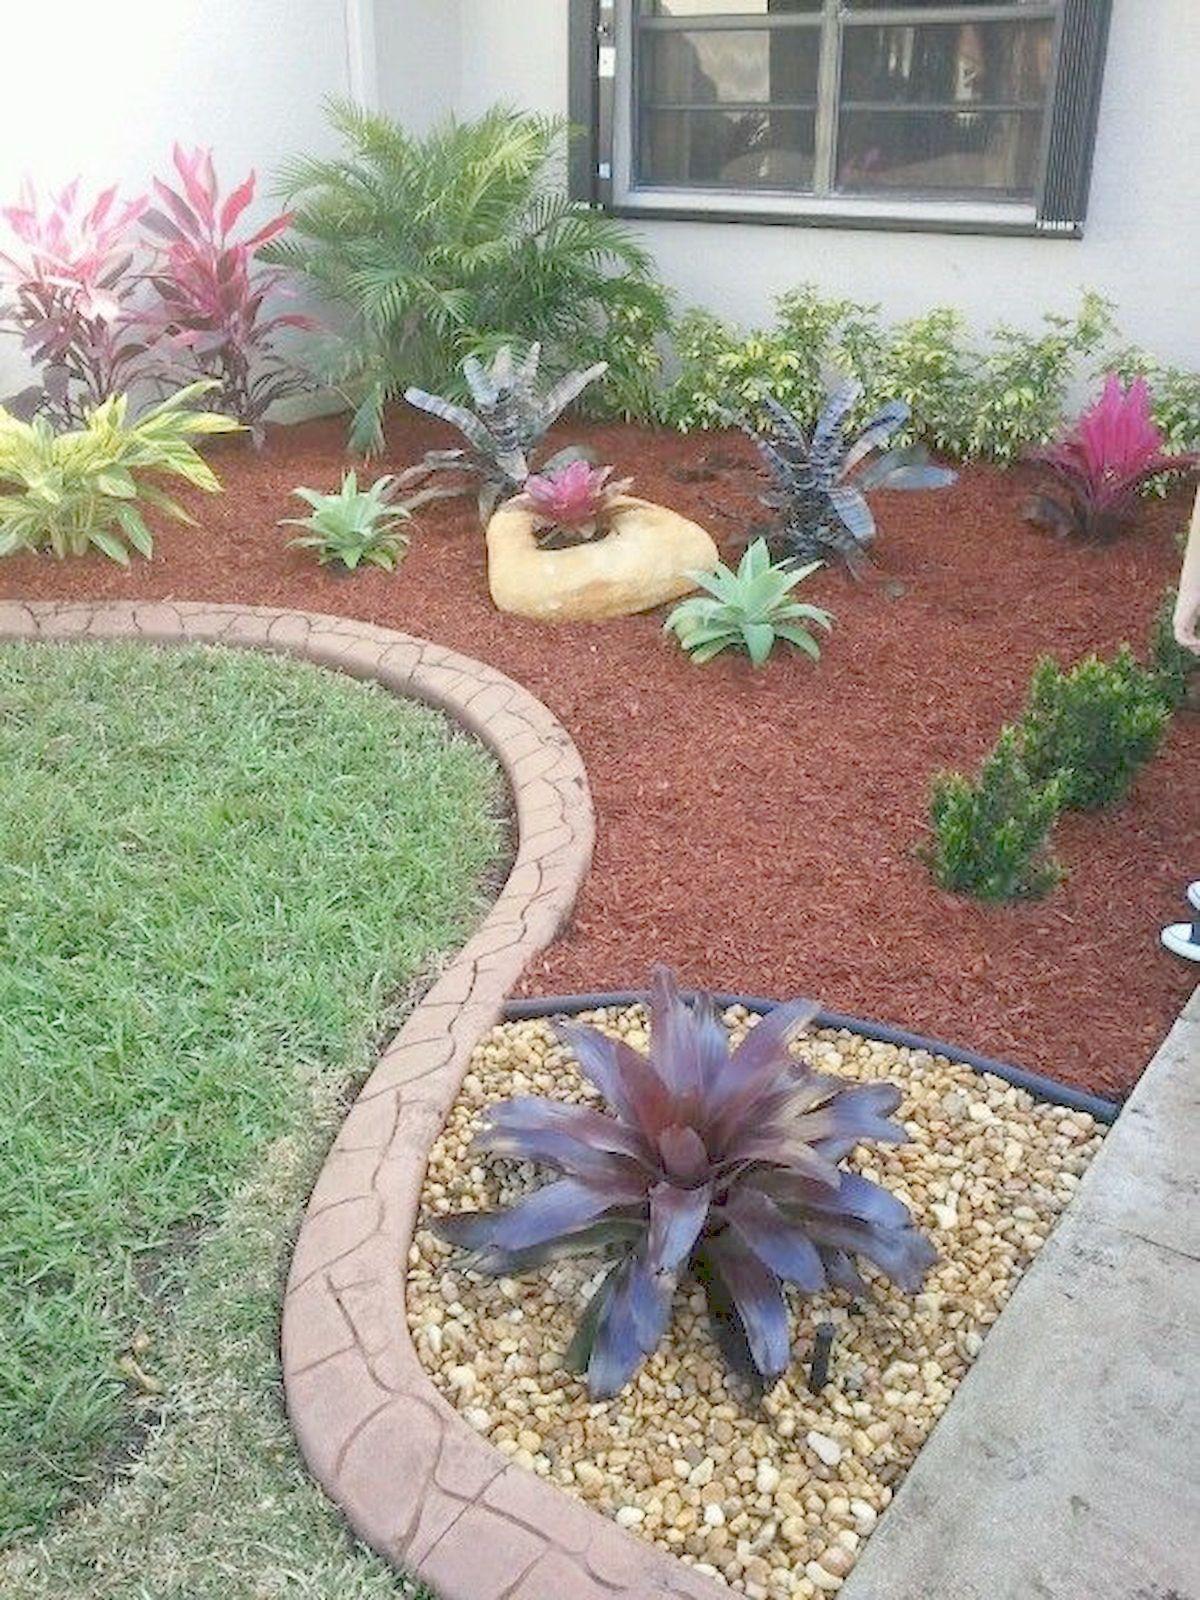 Landscape Gardening Companies Near Me Up Landscape Gardening Jobs